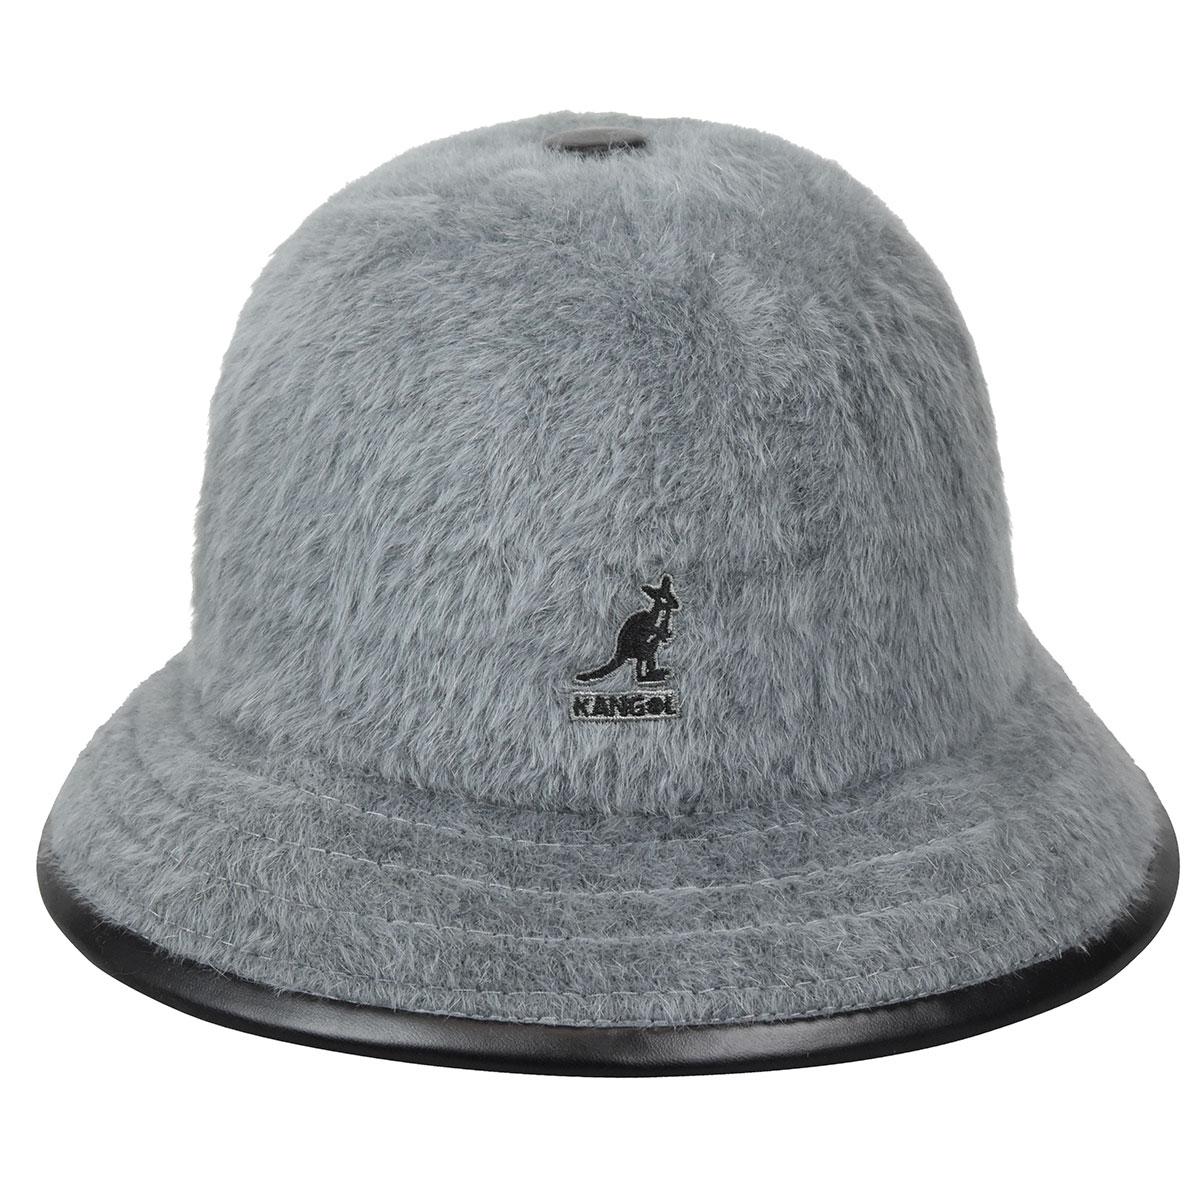 Men's Hats FREE SHIPPING & RETURNS